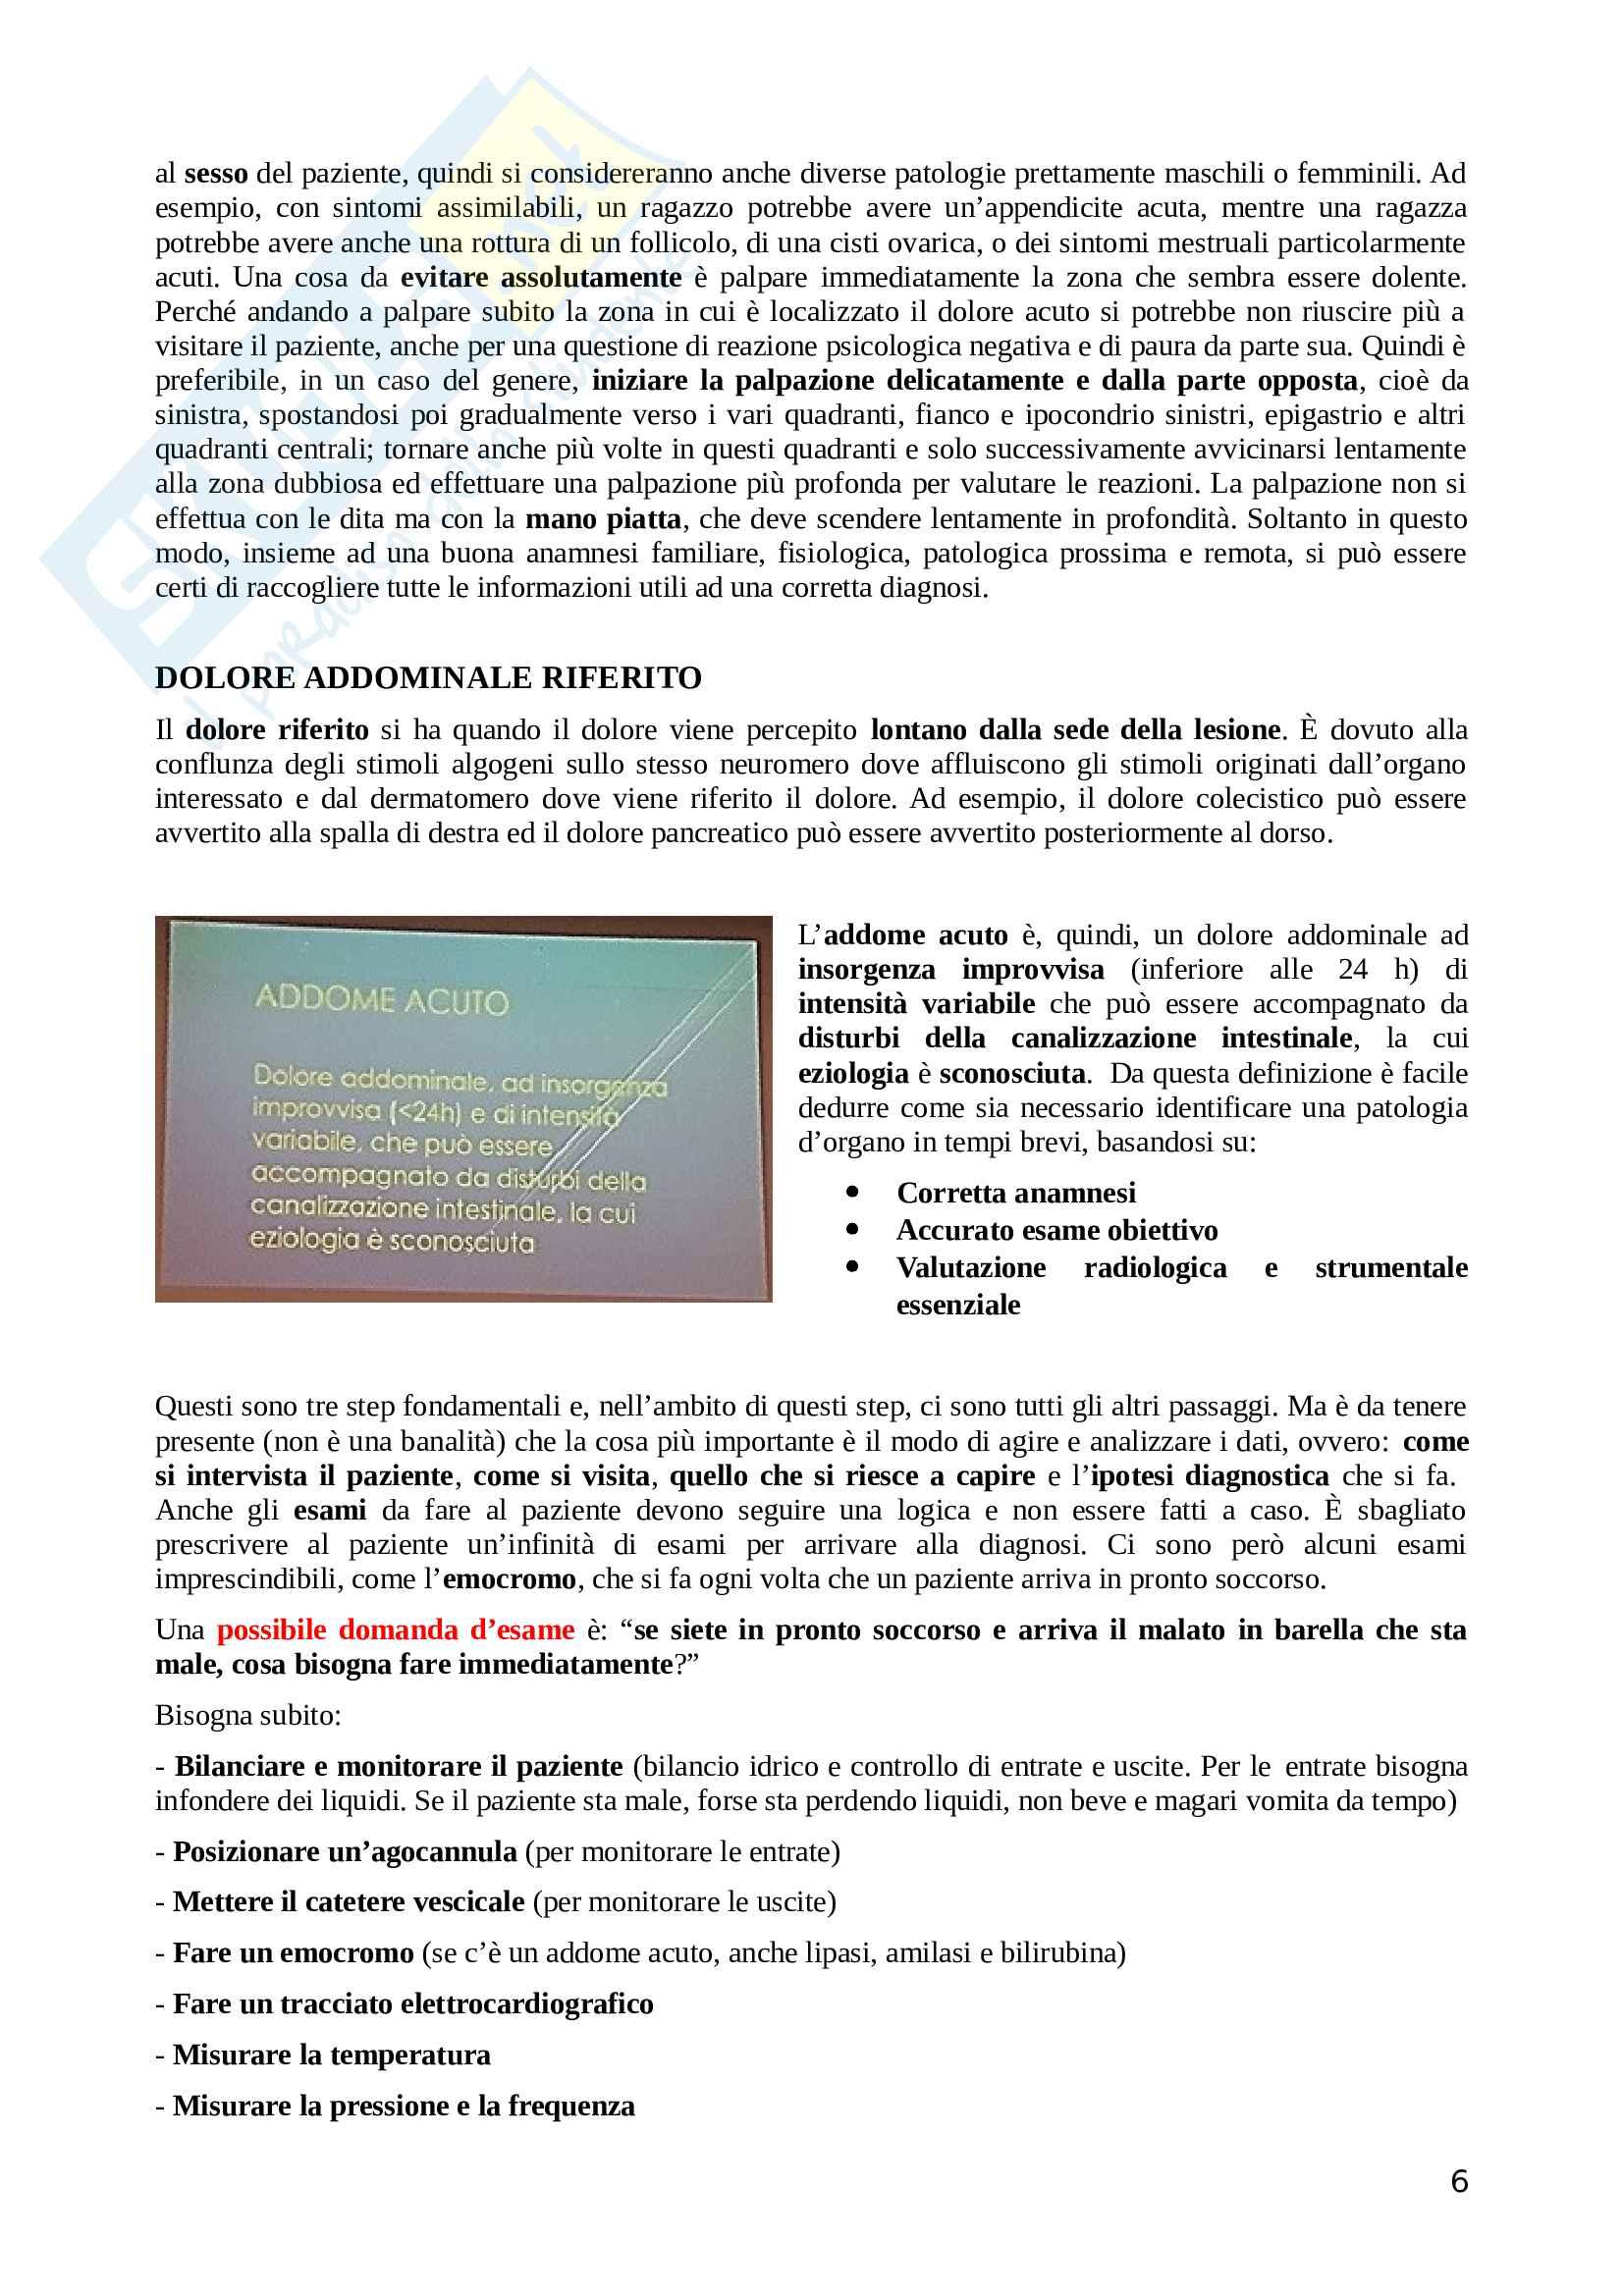 Fisiopatologia Addome Acuto Pag. 6